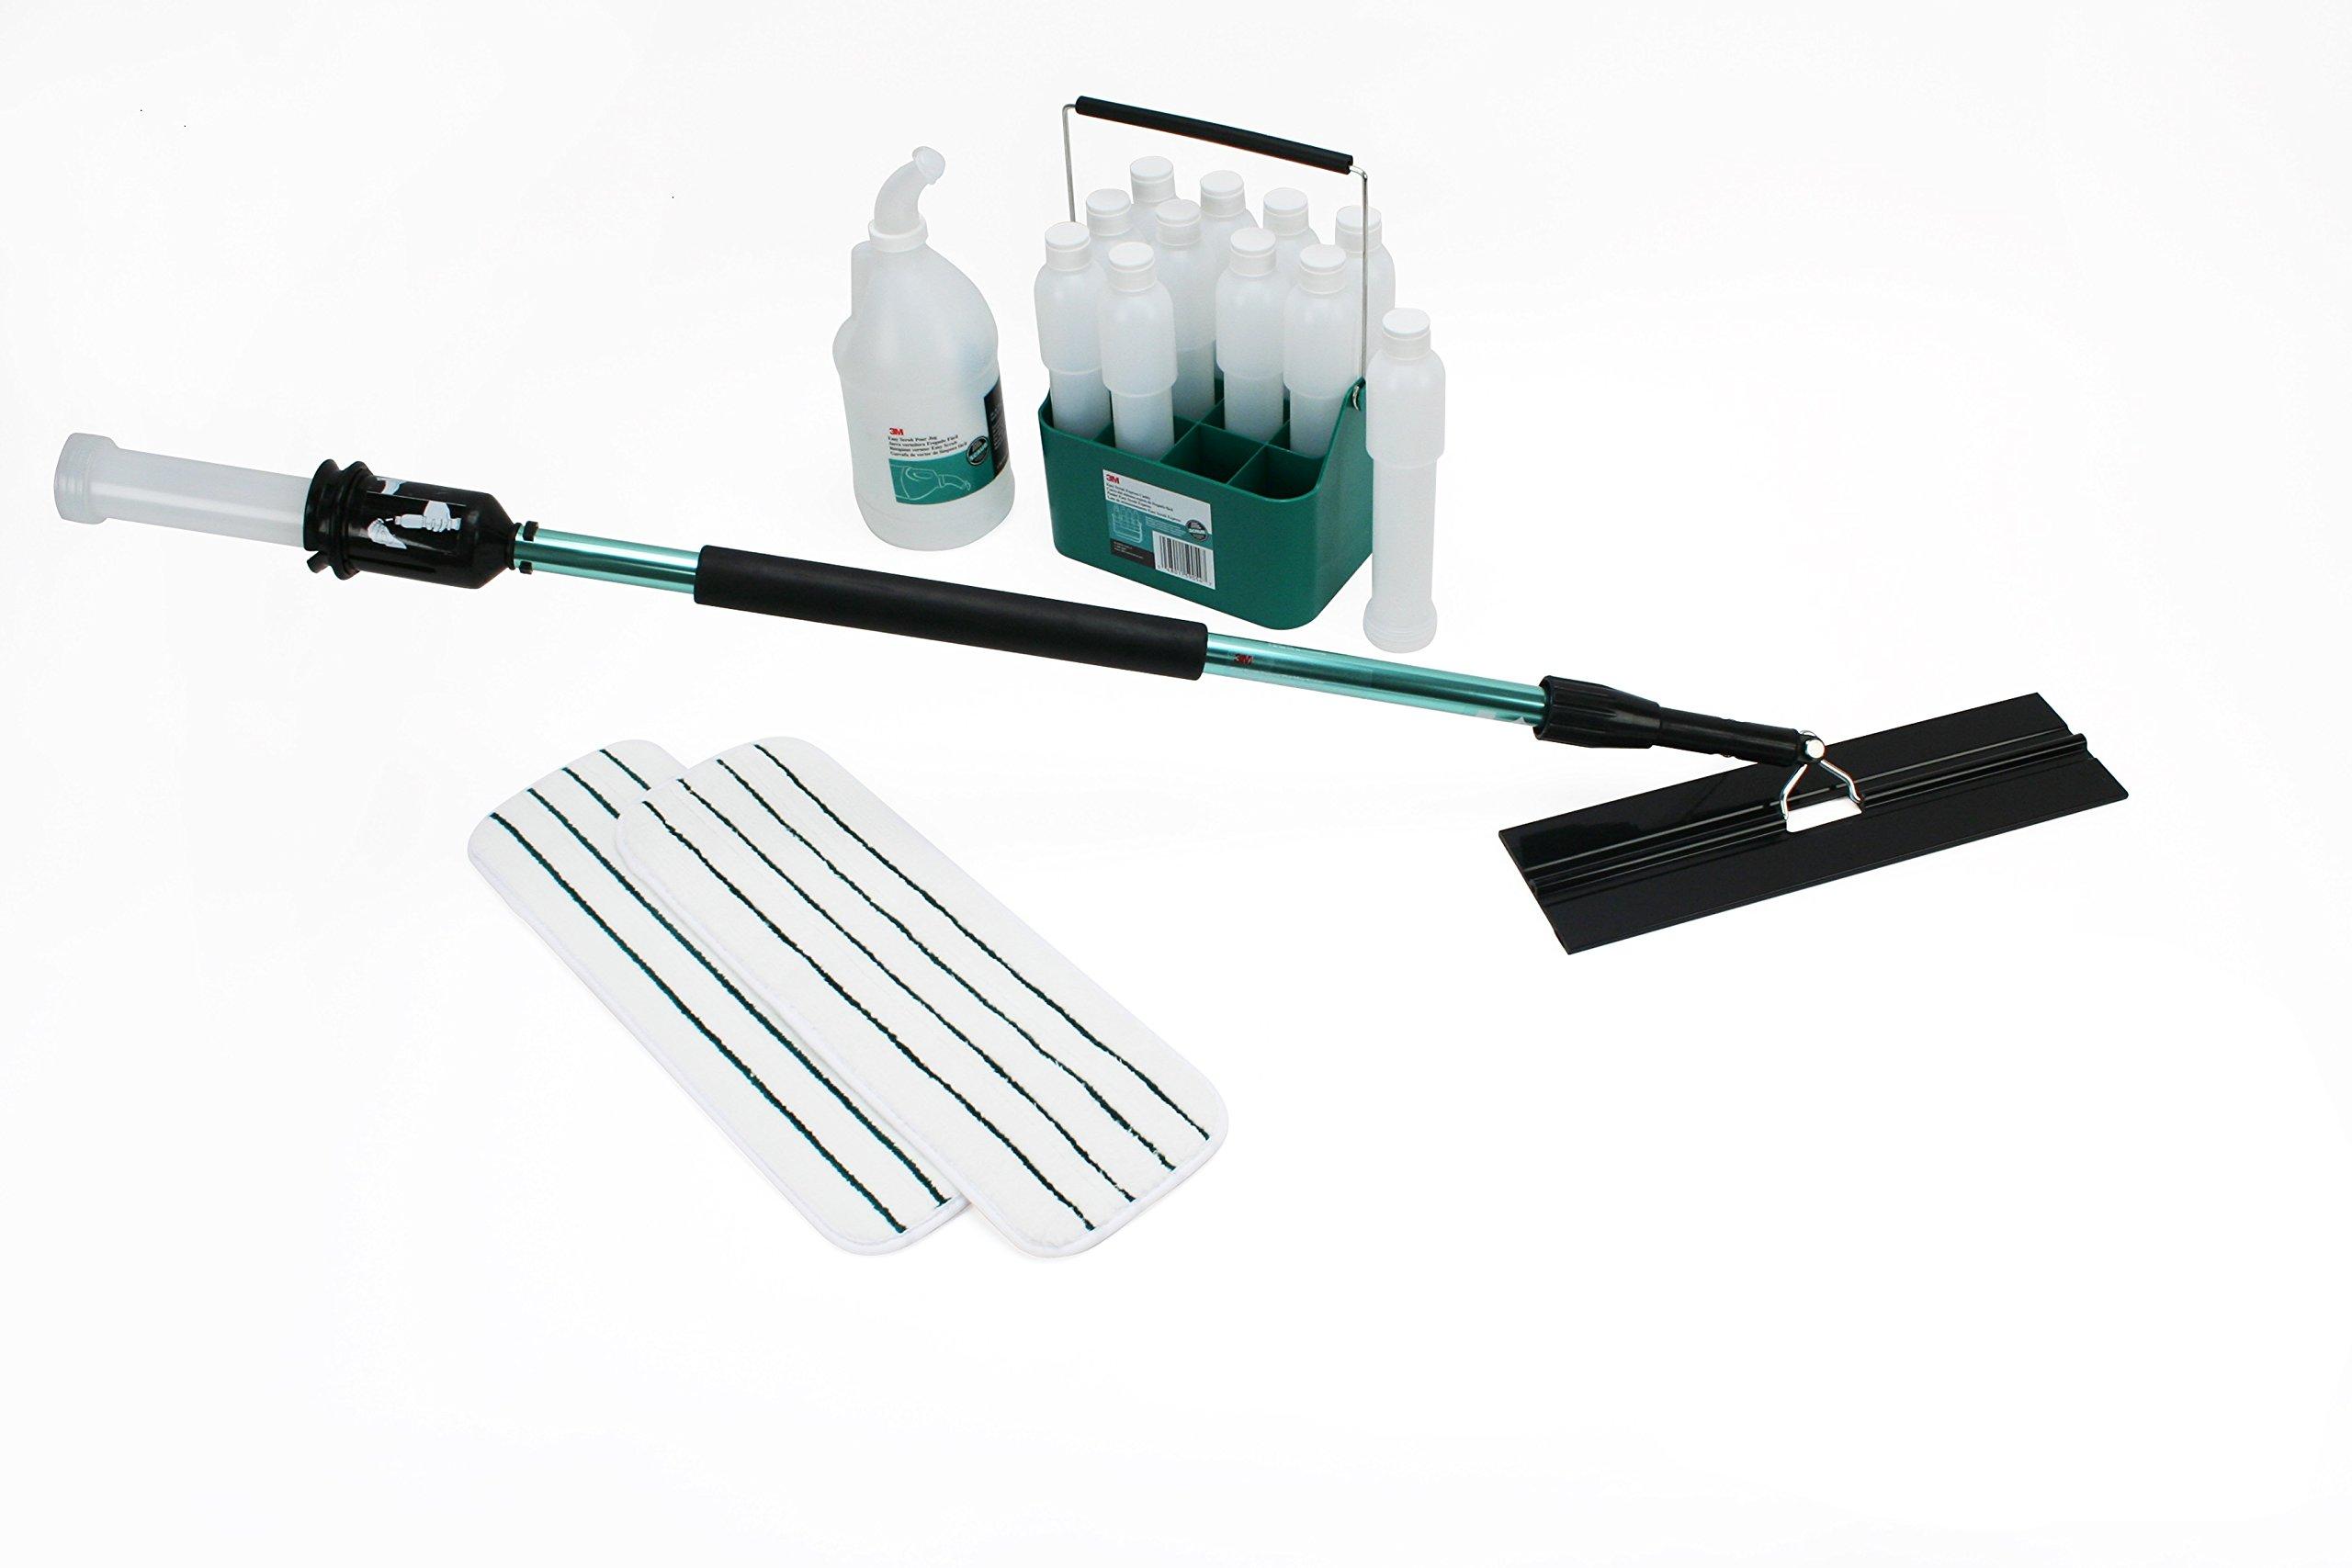 3M Easy Scrub Express Starter Kit, Flat Mop System by 3M